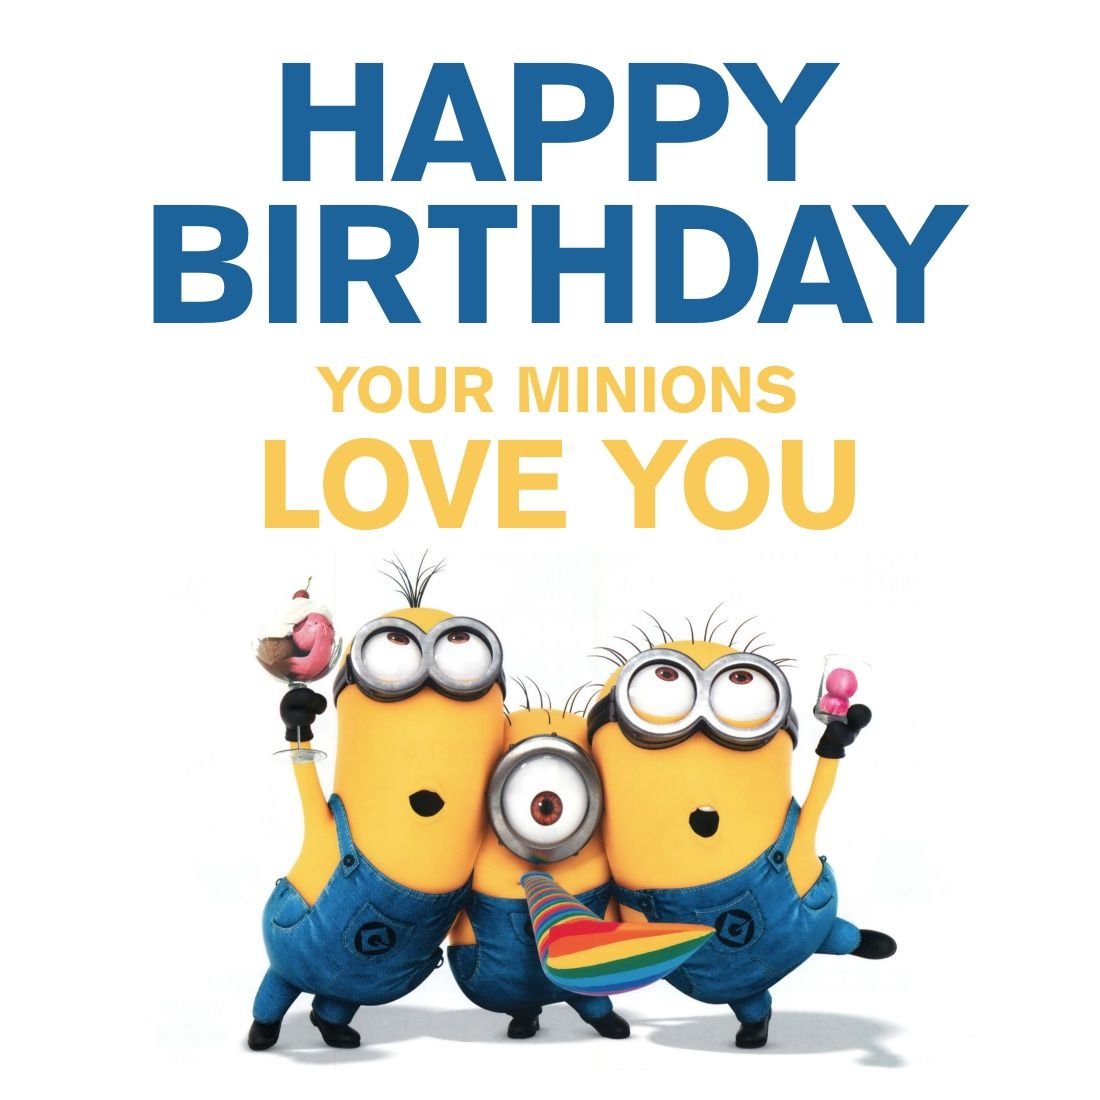 malvorlagen minions happy birthday - 10 images - minion birthday